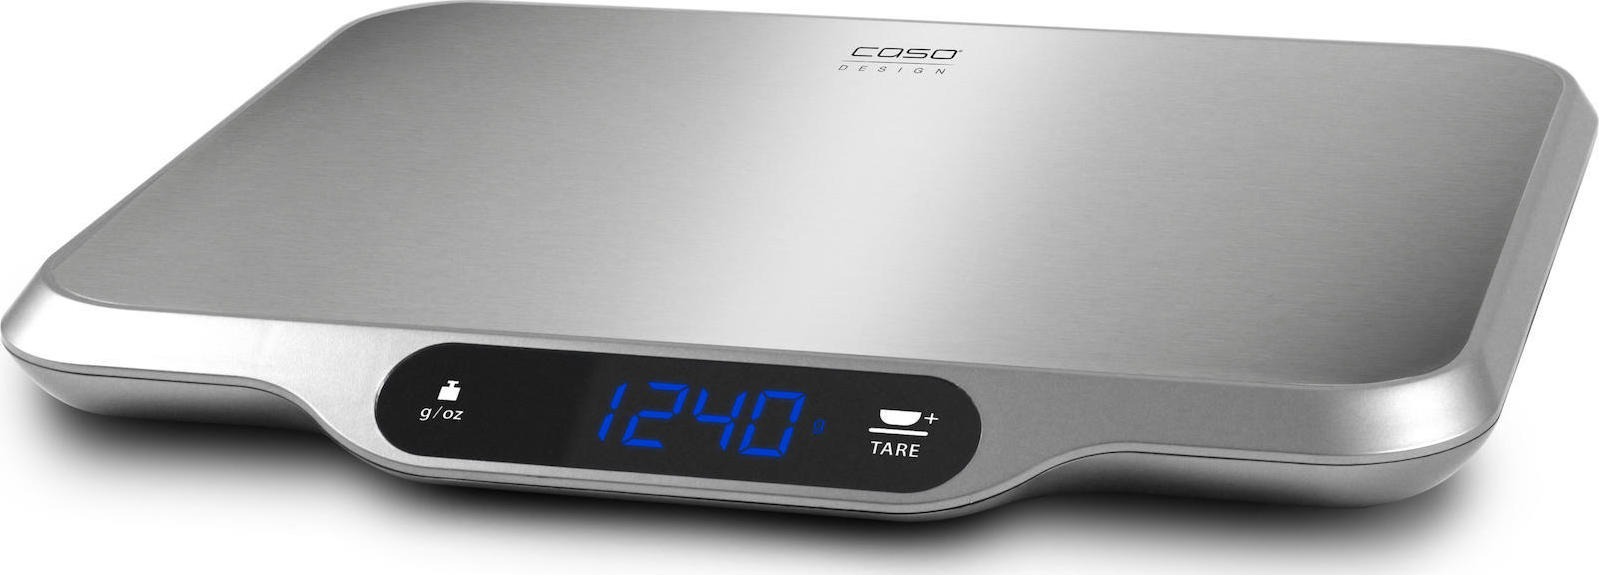 Caso Ψηφιακή Ζυγαριά Κουζίνας 15kg L 15 (3292) - Πληρωμή και σε έως 36 Δόσεις!!!